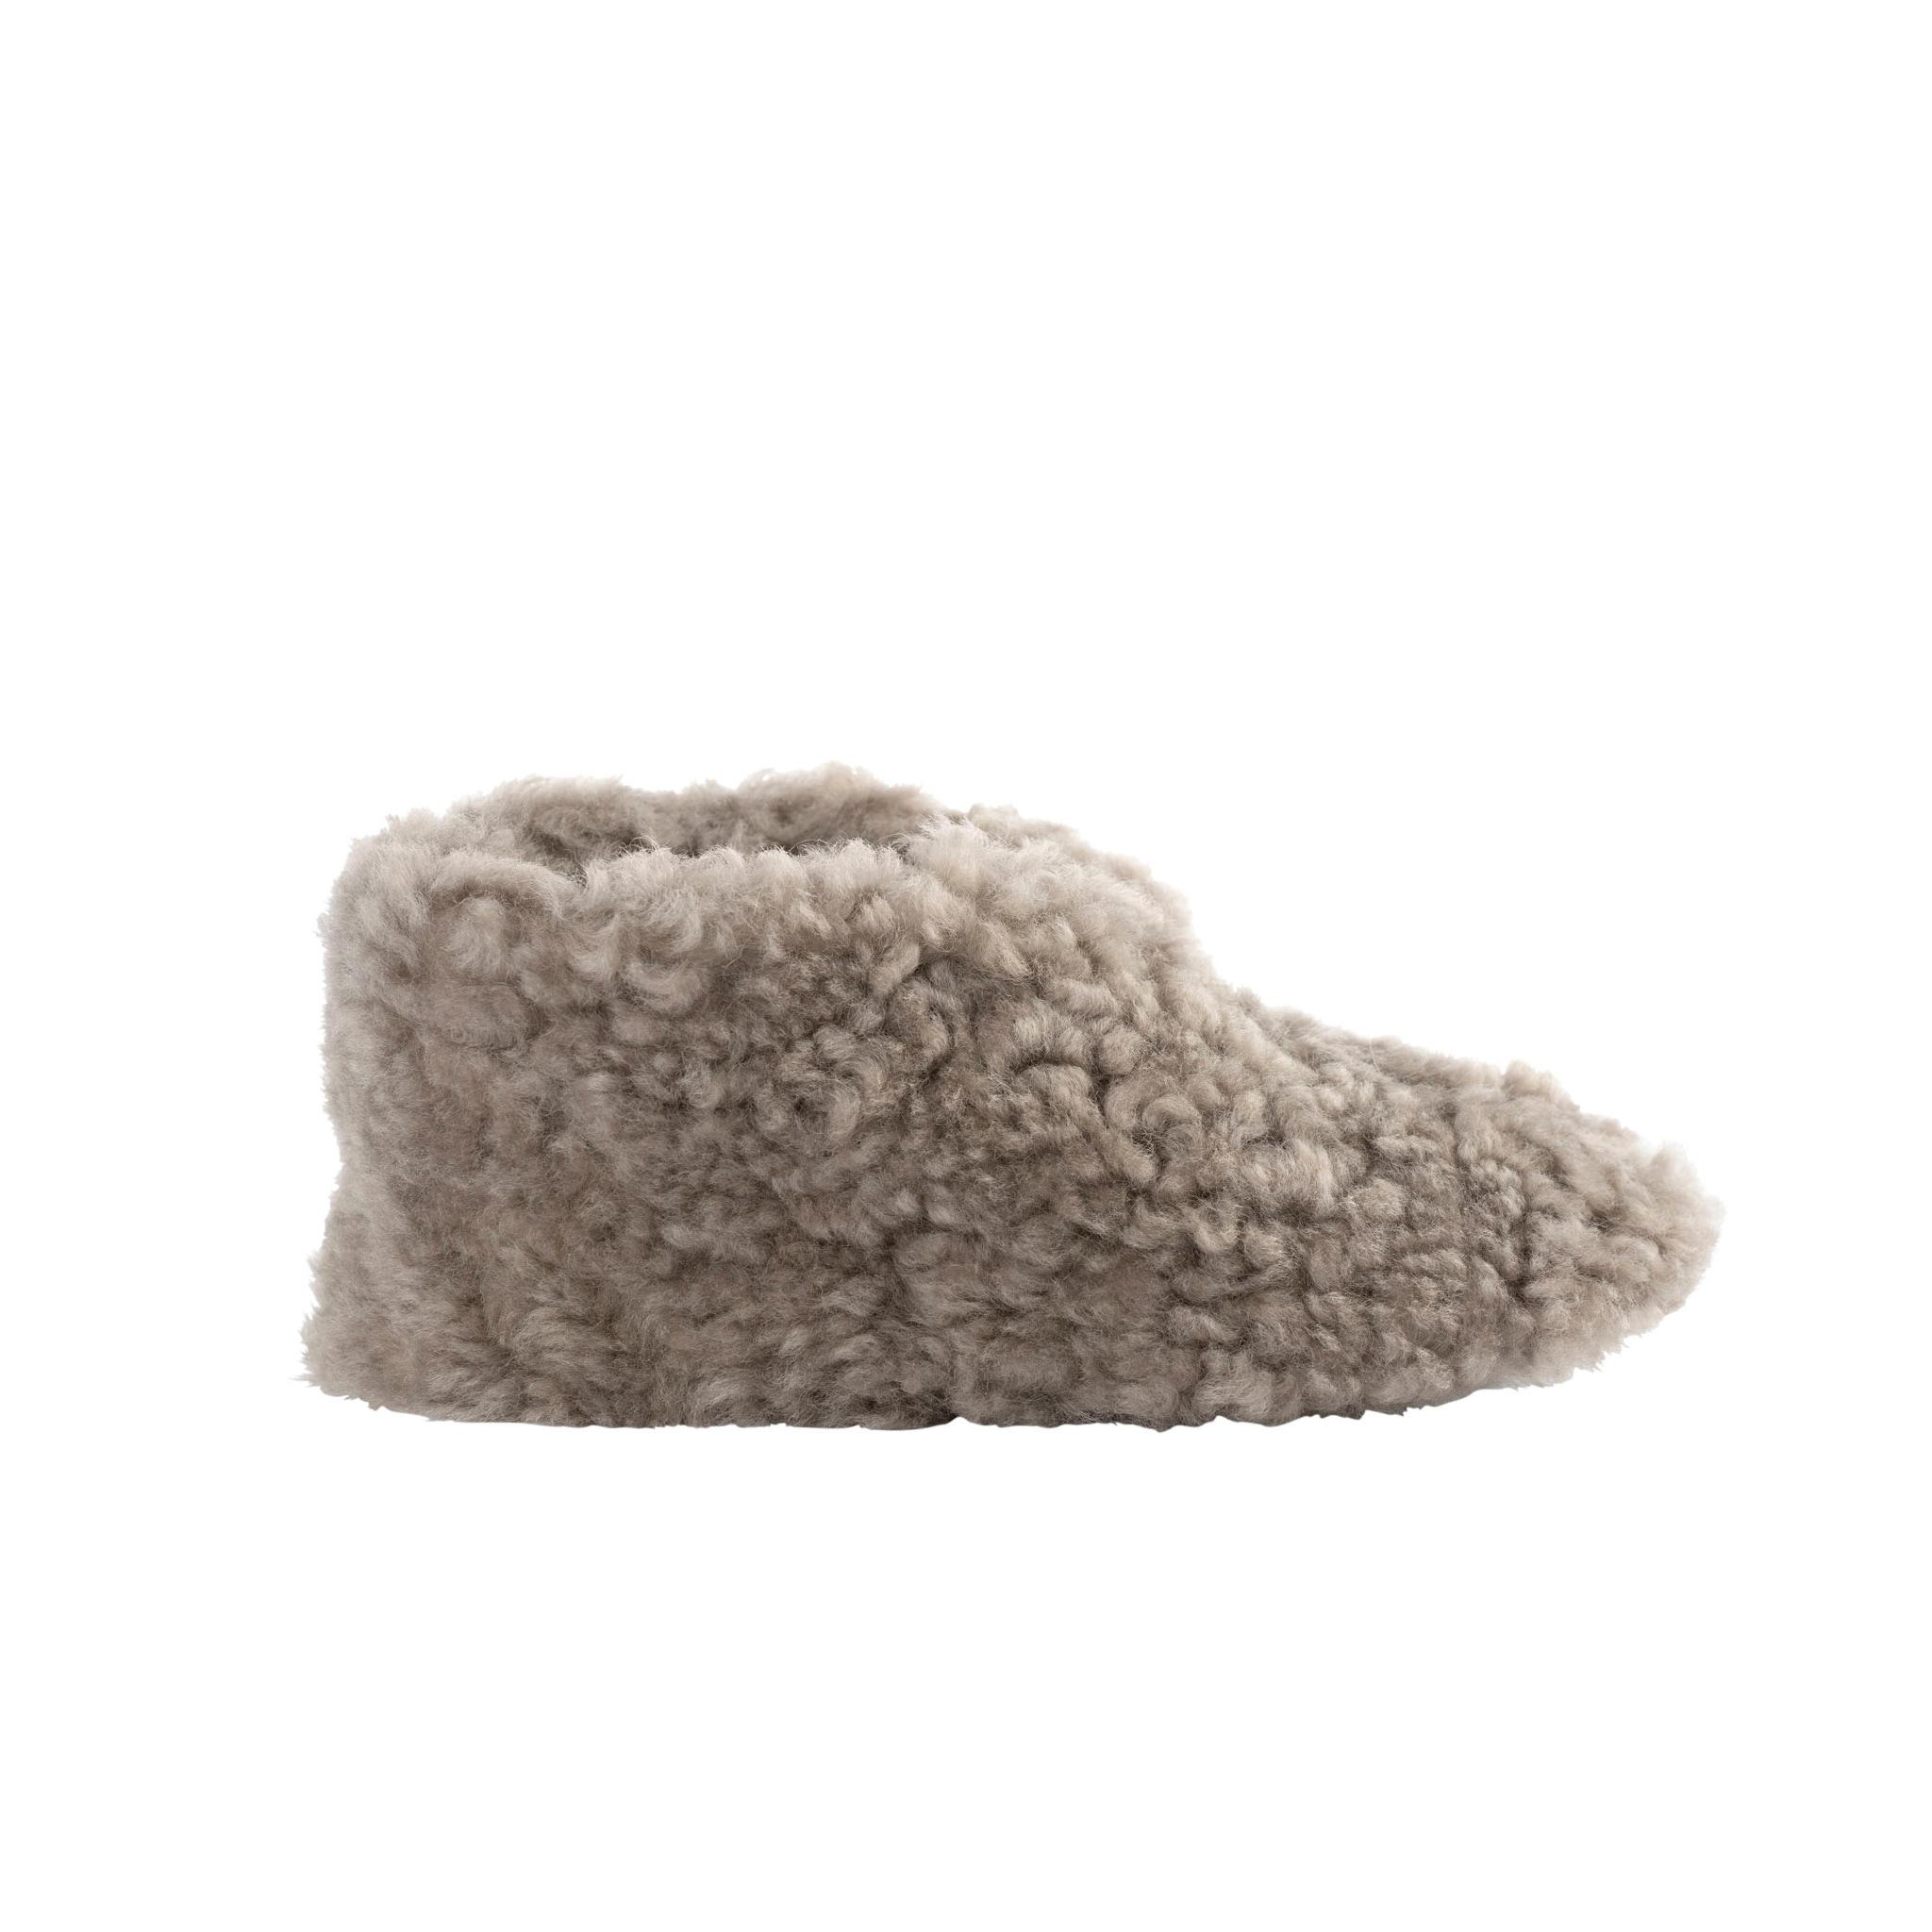 Ulla sheepskin slippers